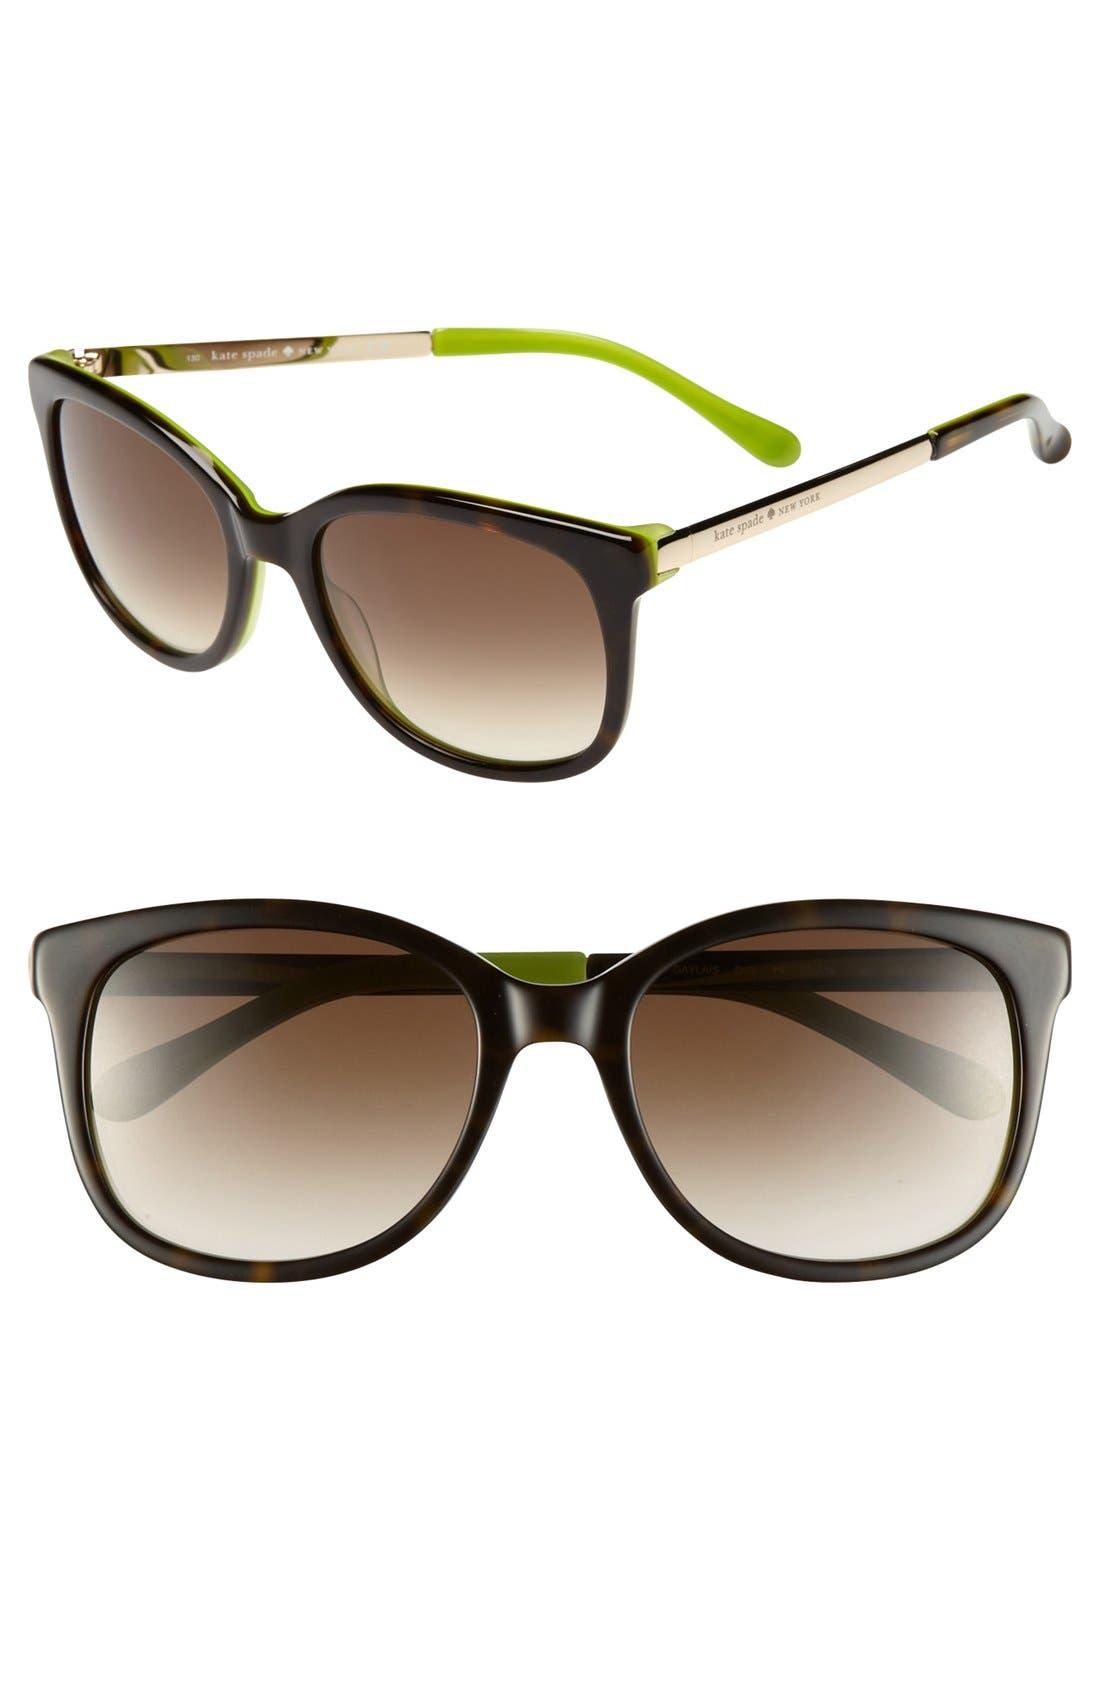 Main Image - kate spade new york 'gayla' 52mm sunglasses